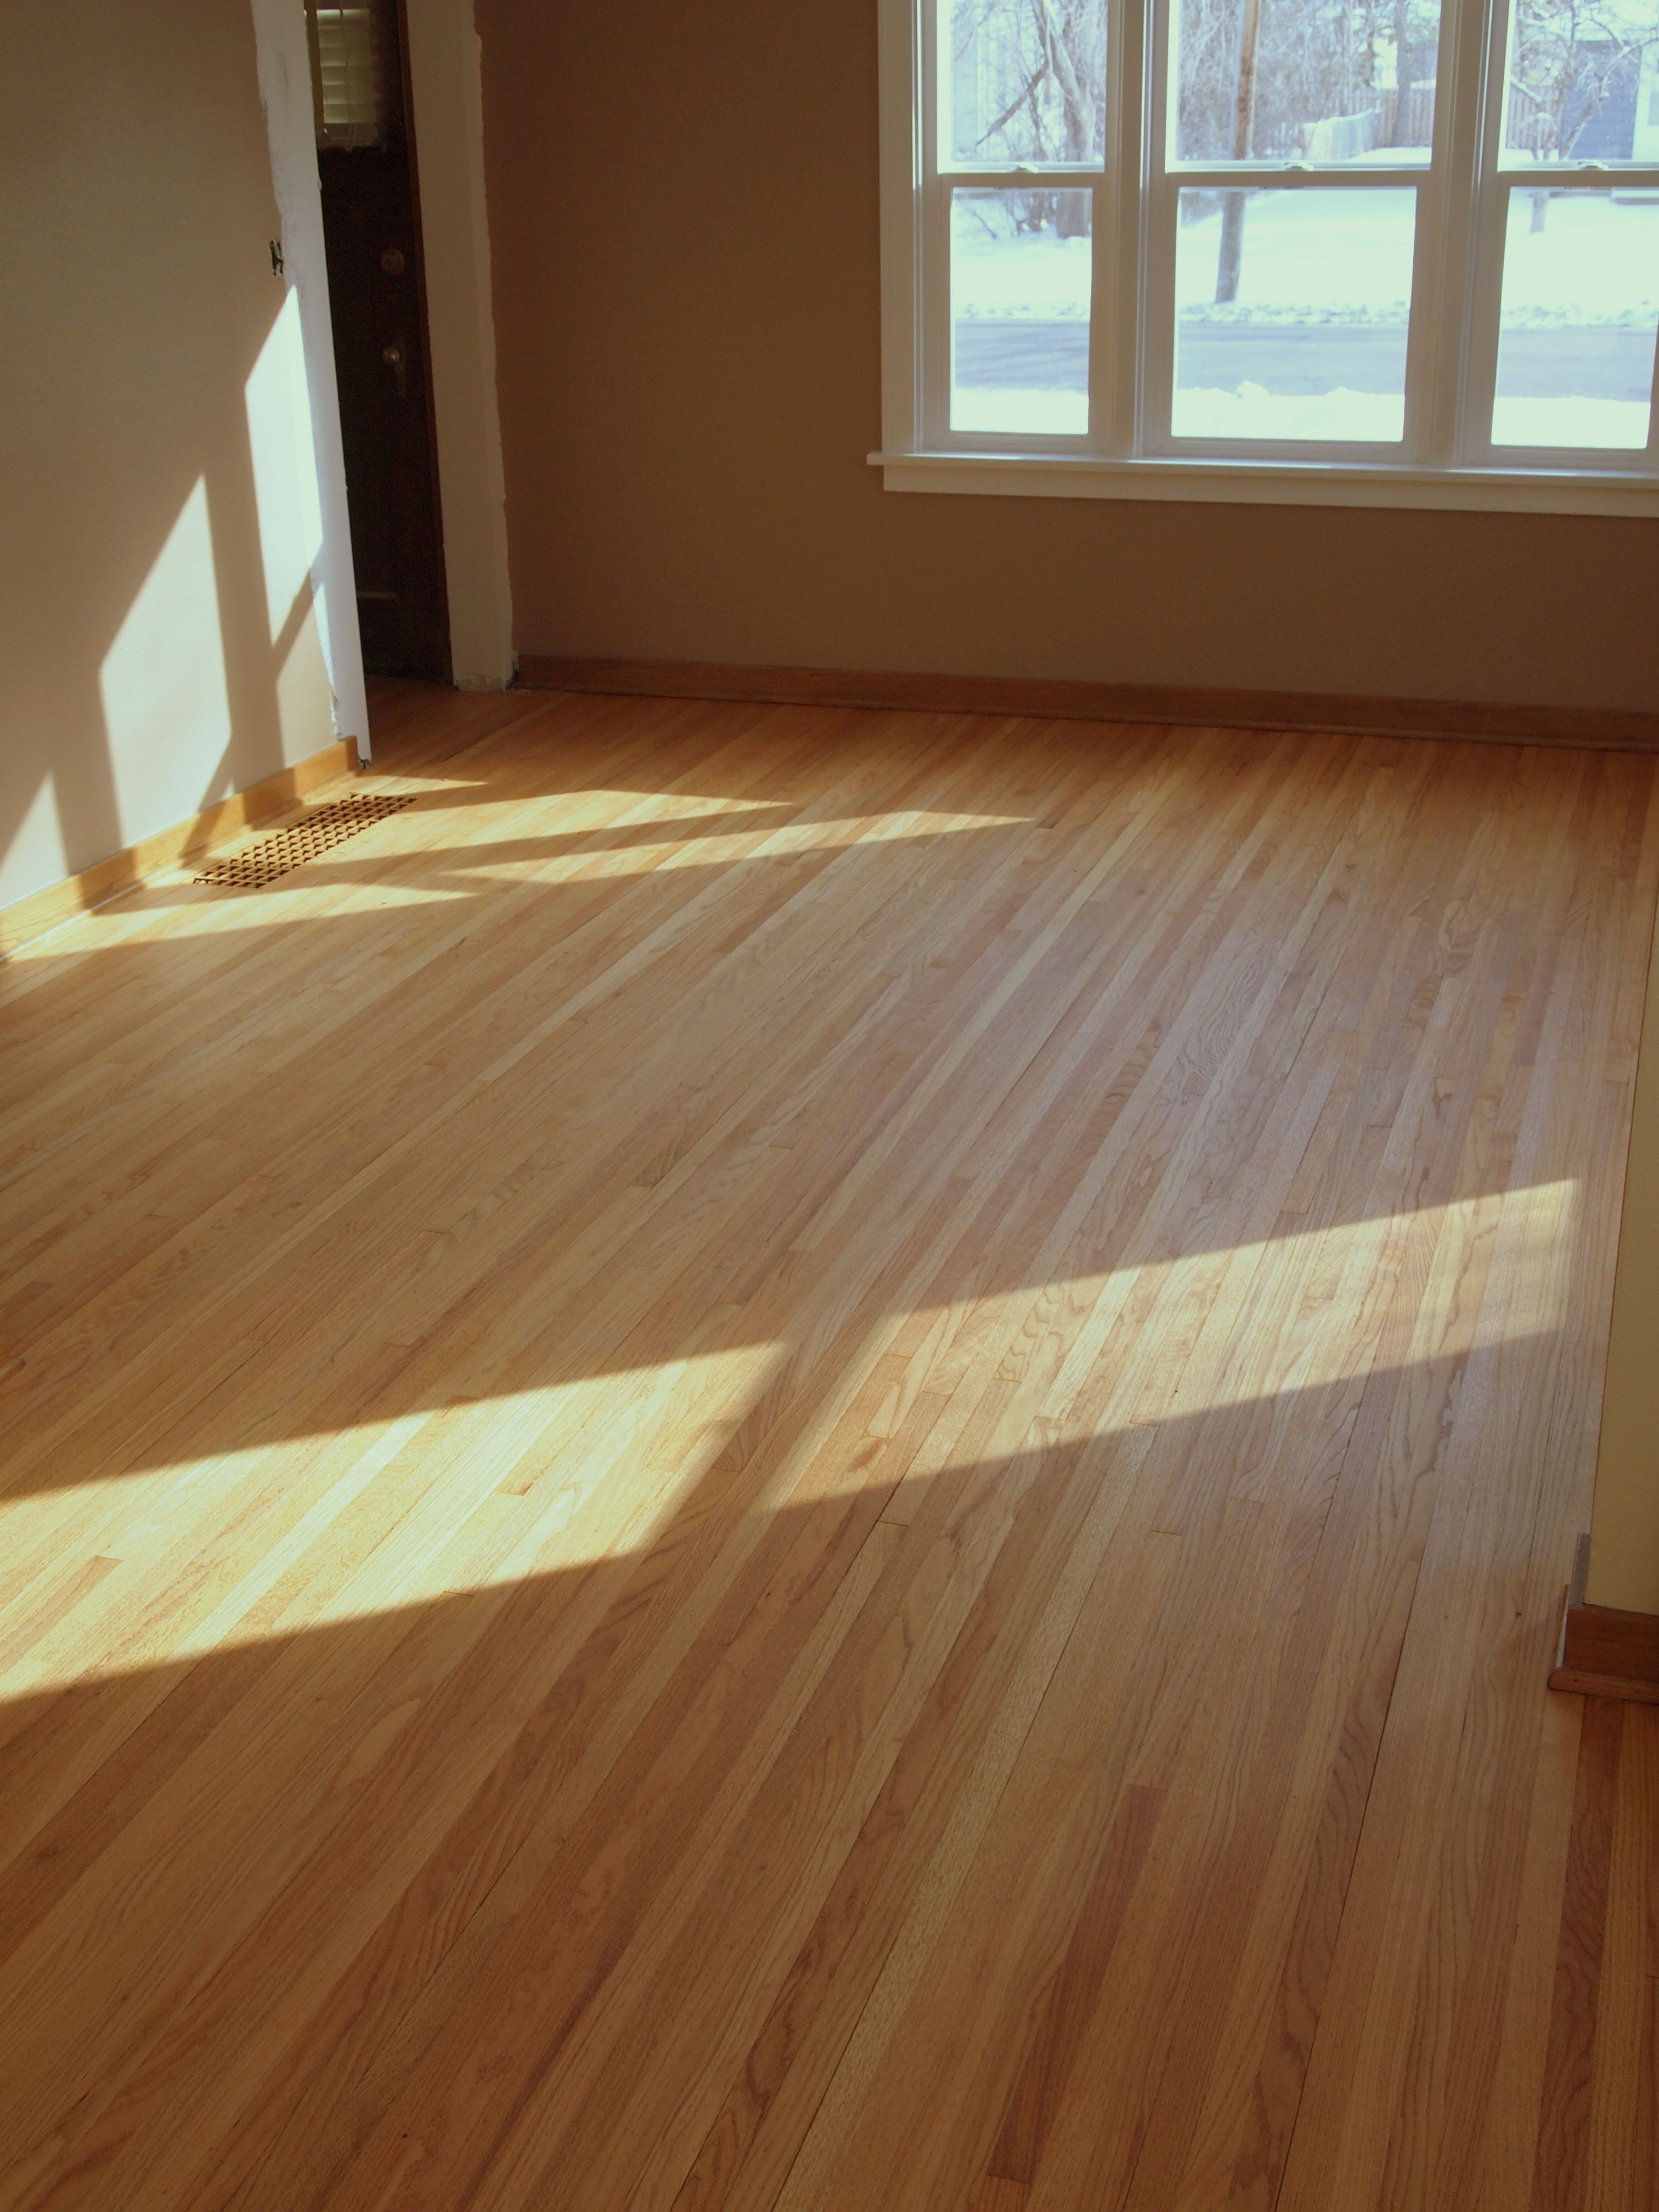 Thin Strip Hardwood Flooring Wide Hardwood Floors Hardwood Floors Flooring